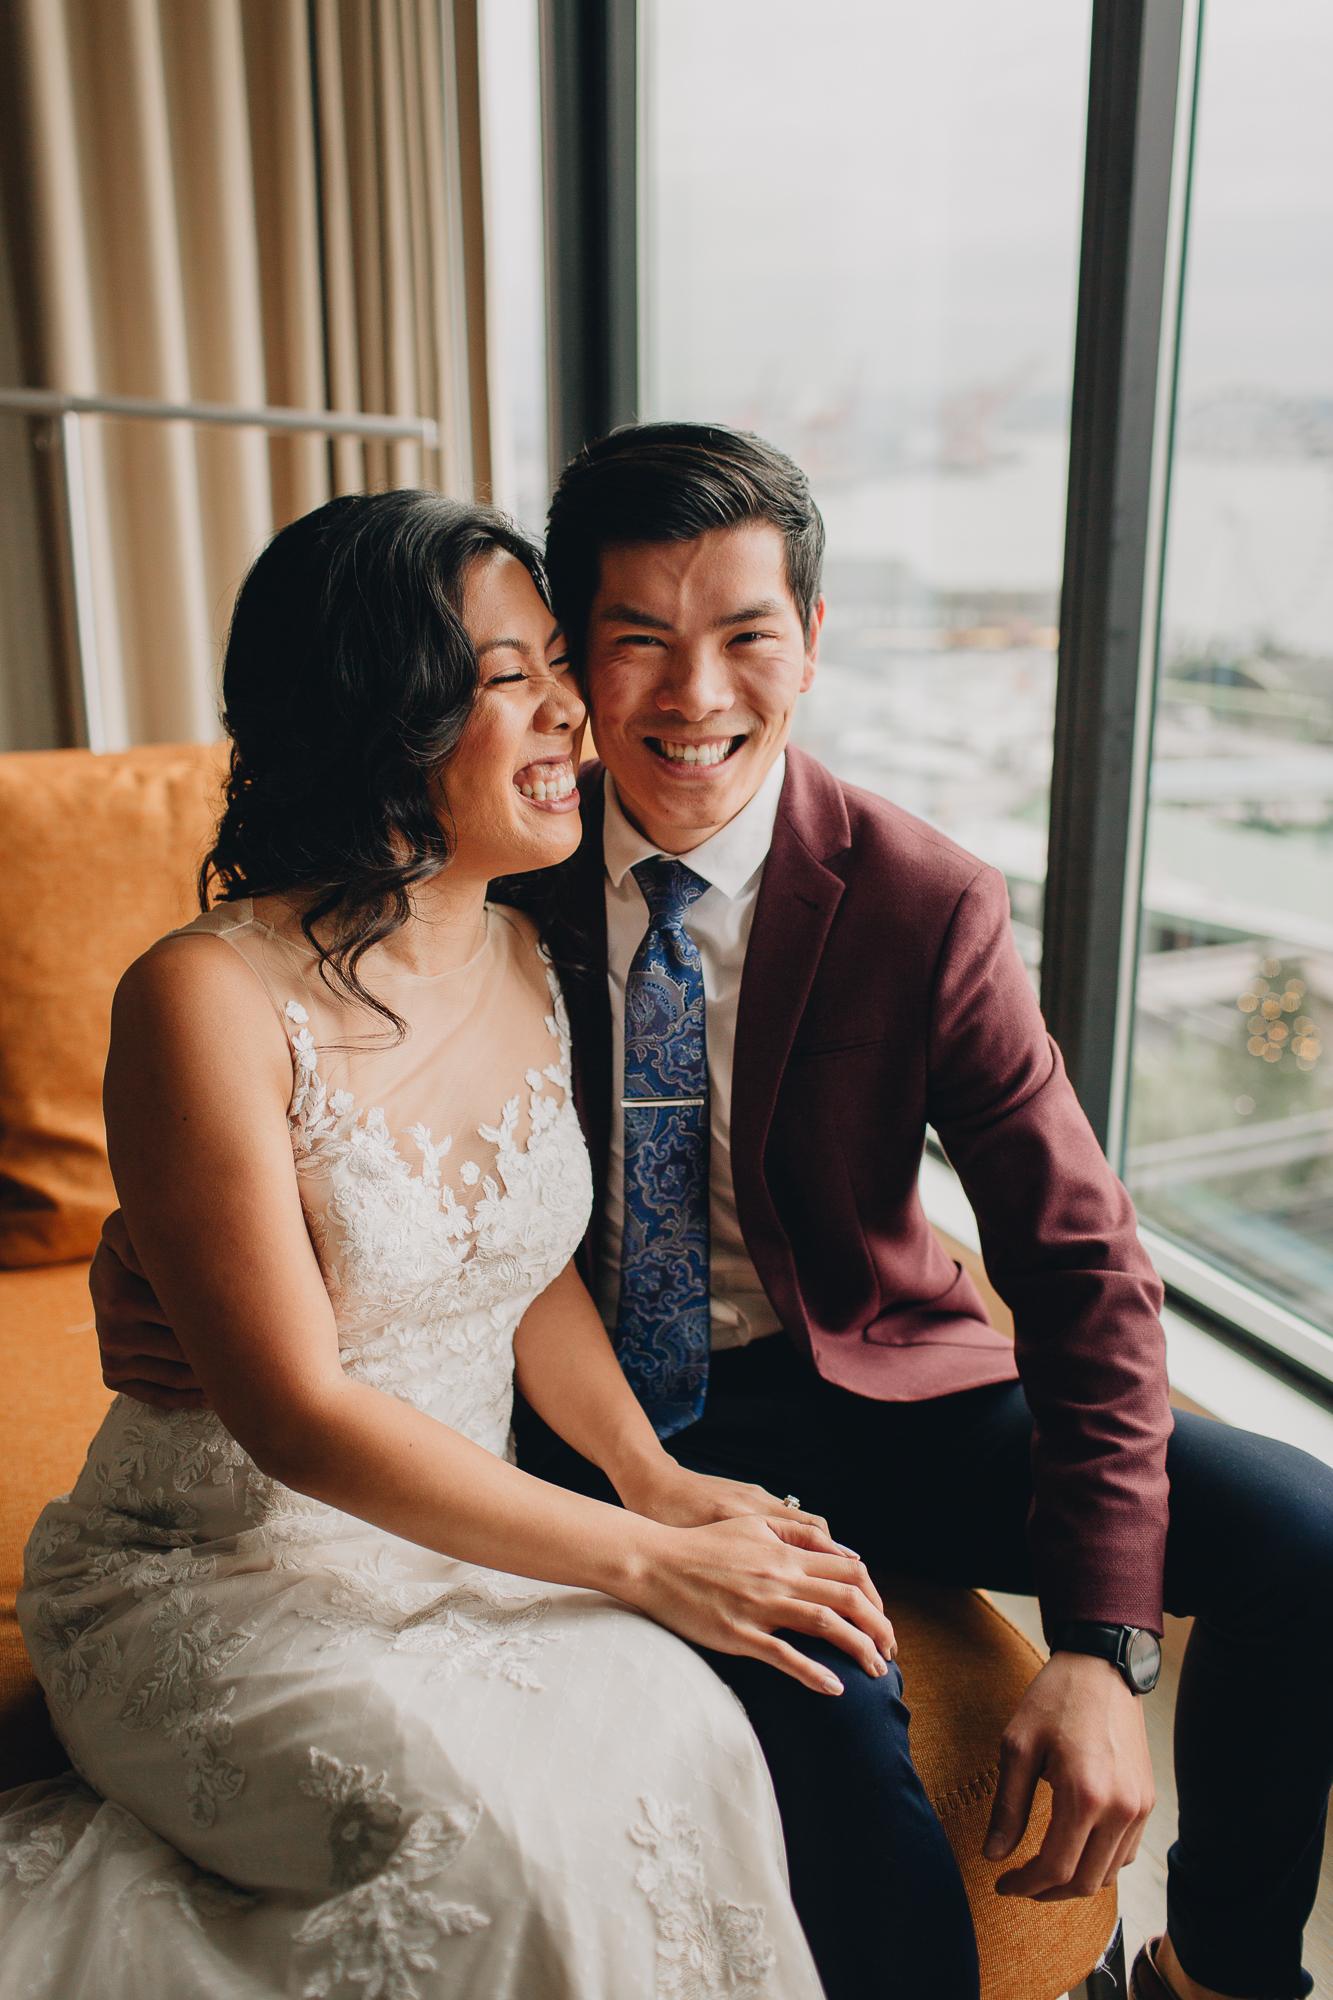 Seattle courthouse wedding photos kristawelch23.jpg